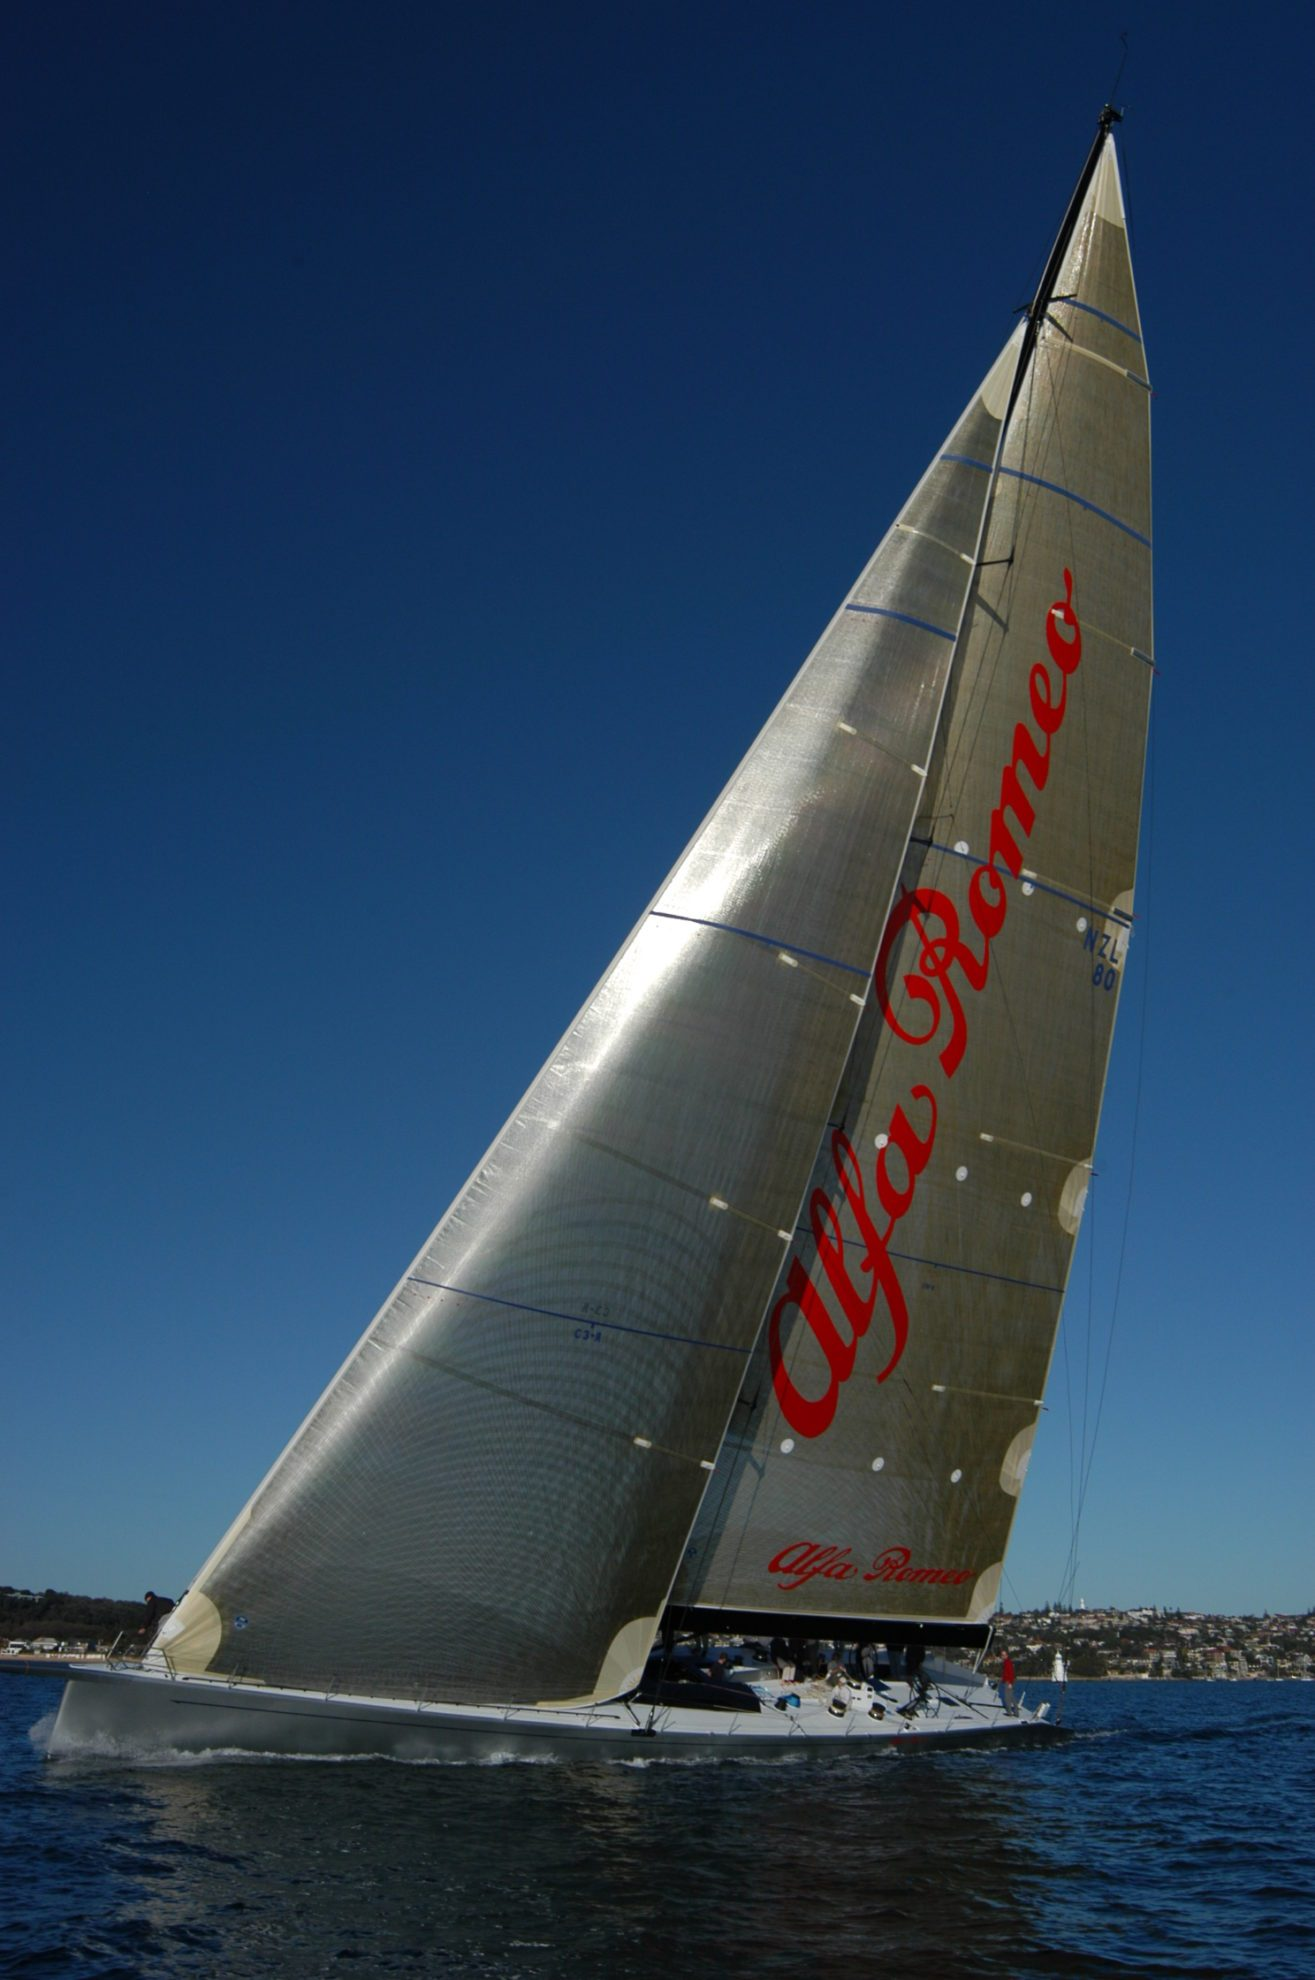 Новозеландская яхта Alfa Romeo II